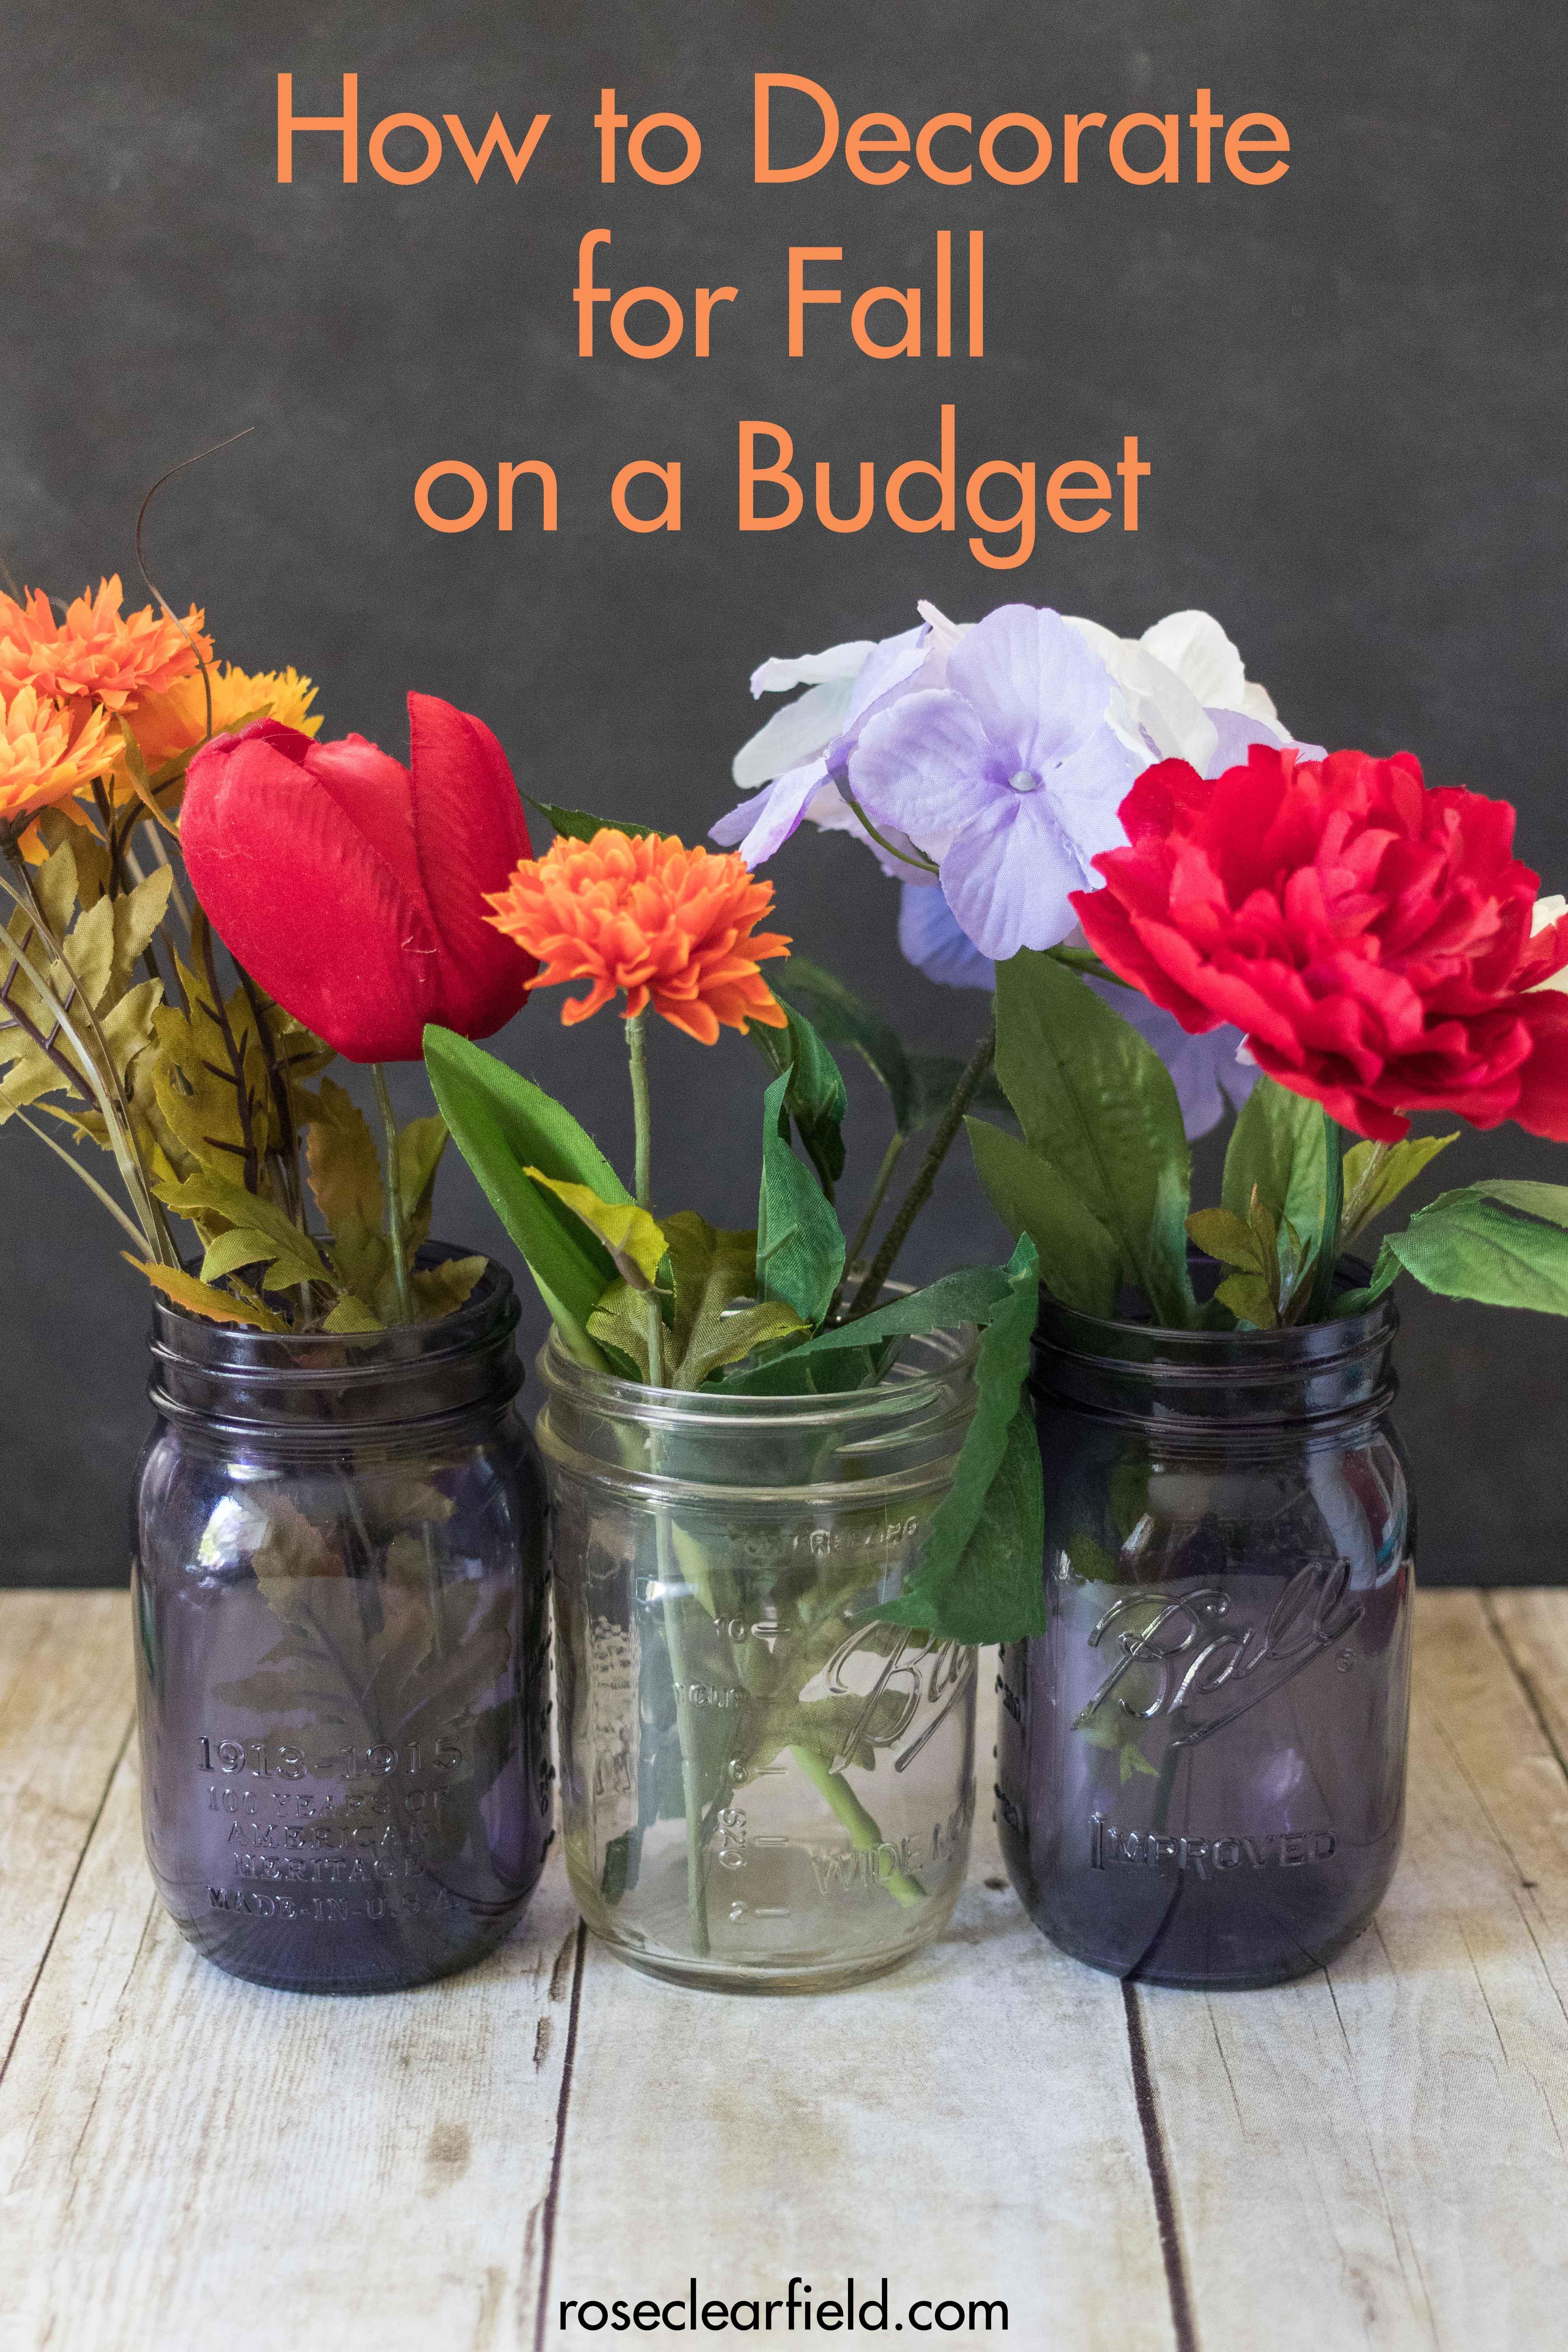 Fall Decor on a Budget